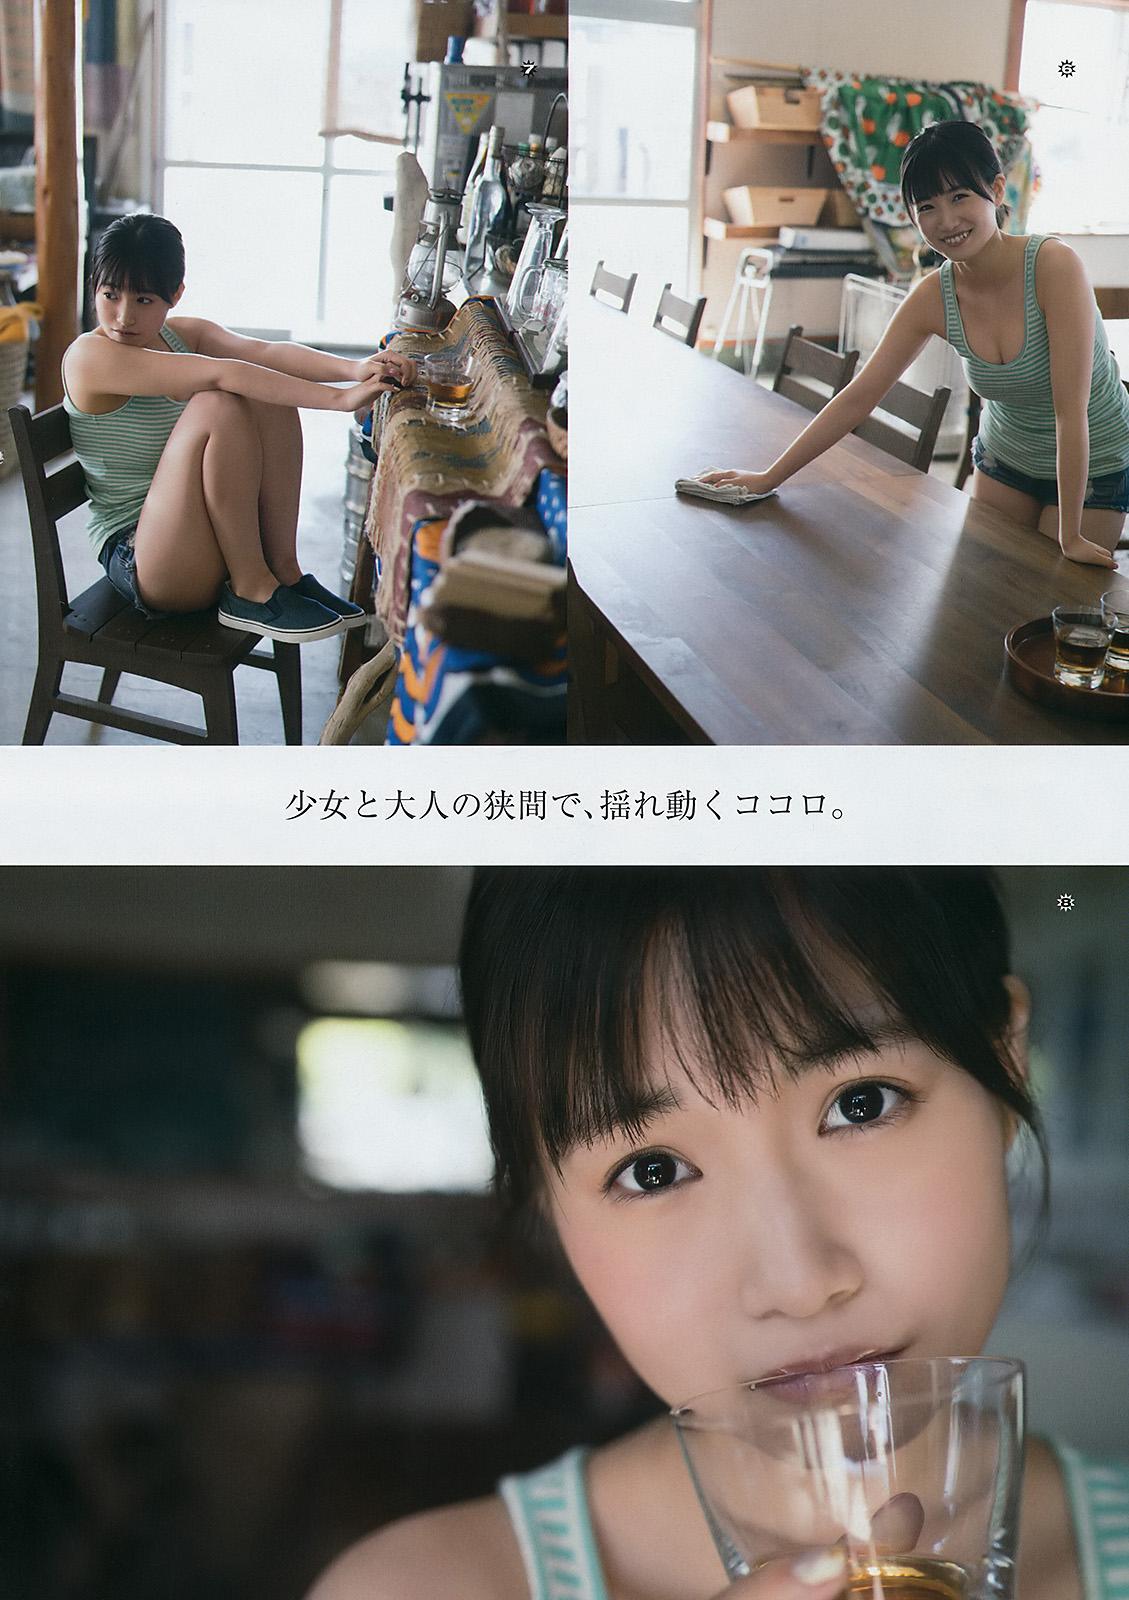 HKT48朝長美桜(19)の水着グラビア、キャバ嬢姿のエロ画像50枚・31枚目の画像